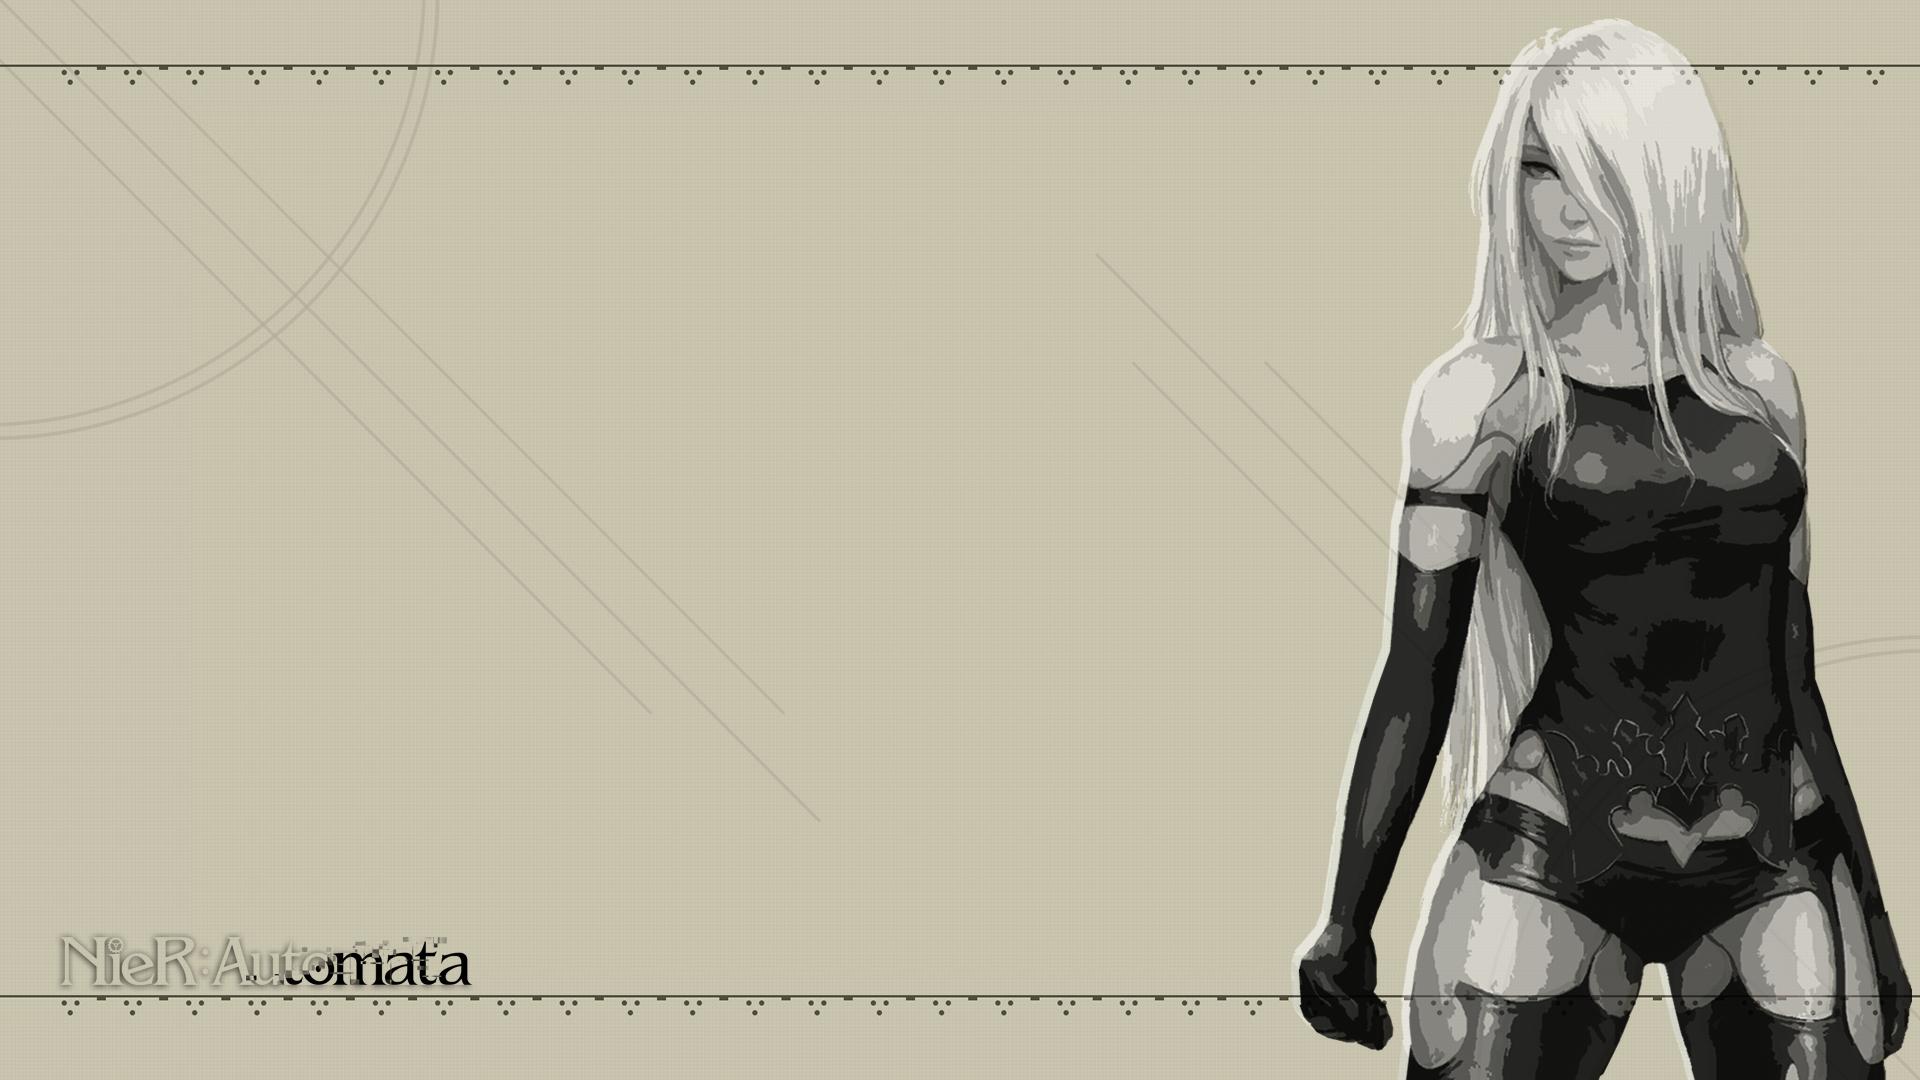 A2 Nier Automata Wallpaper 1920 X 1080 By Cporsdesigns On Deviantart